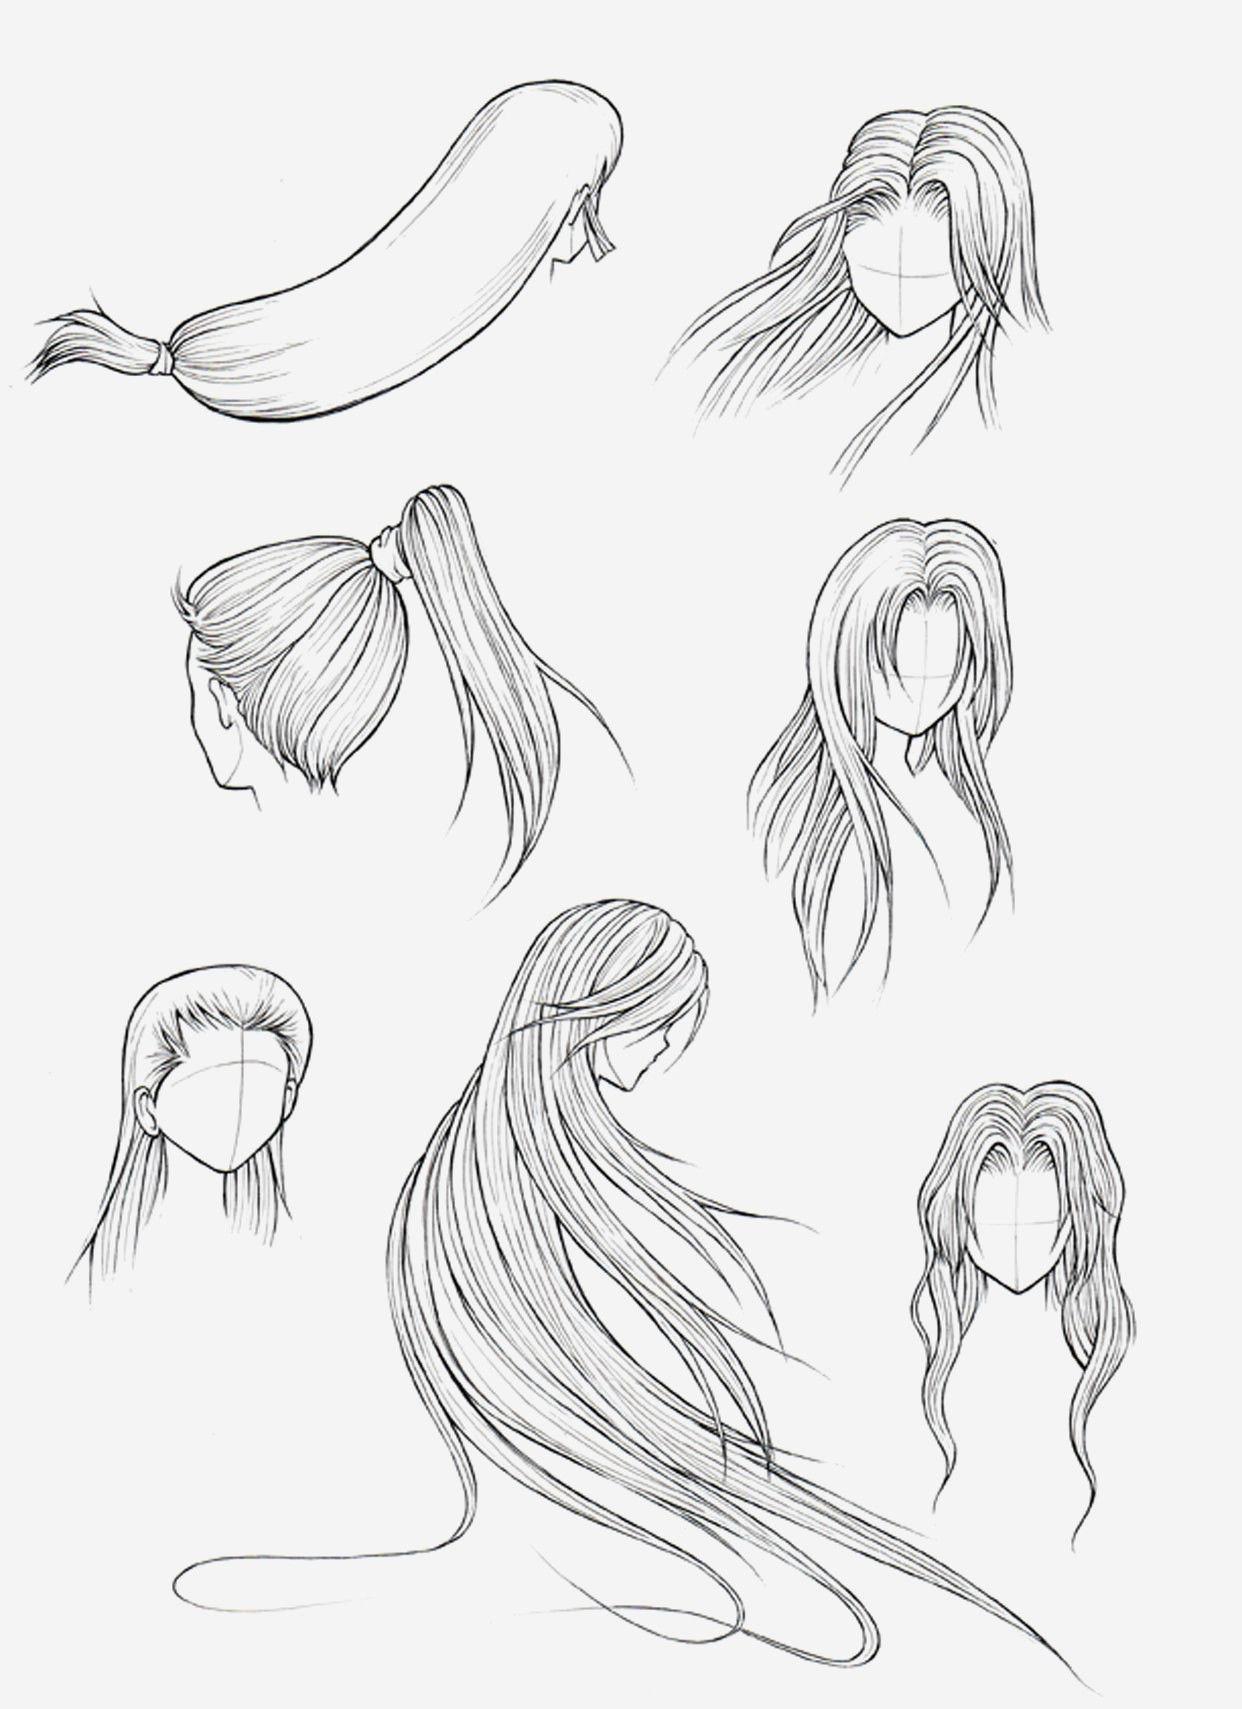 40+ Dessin femme coiffure idees en 2021